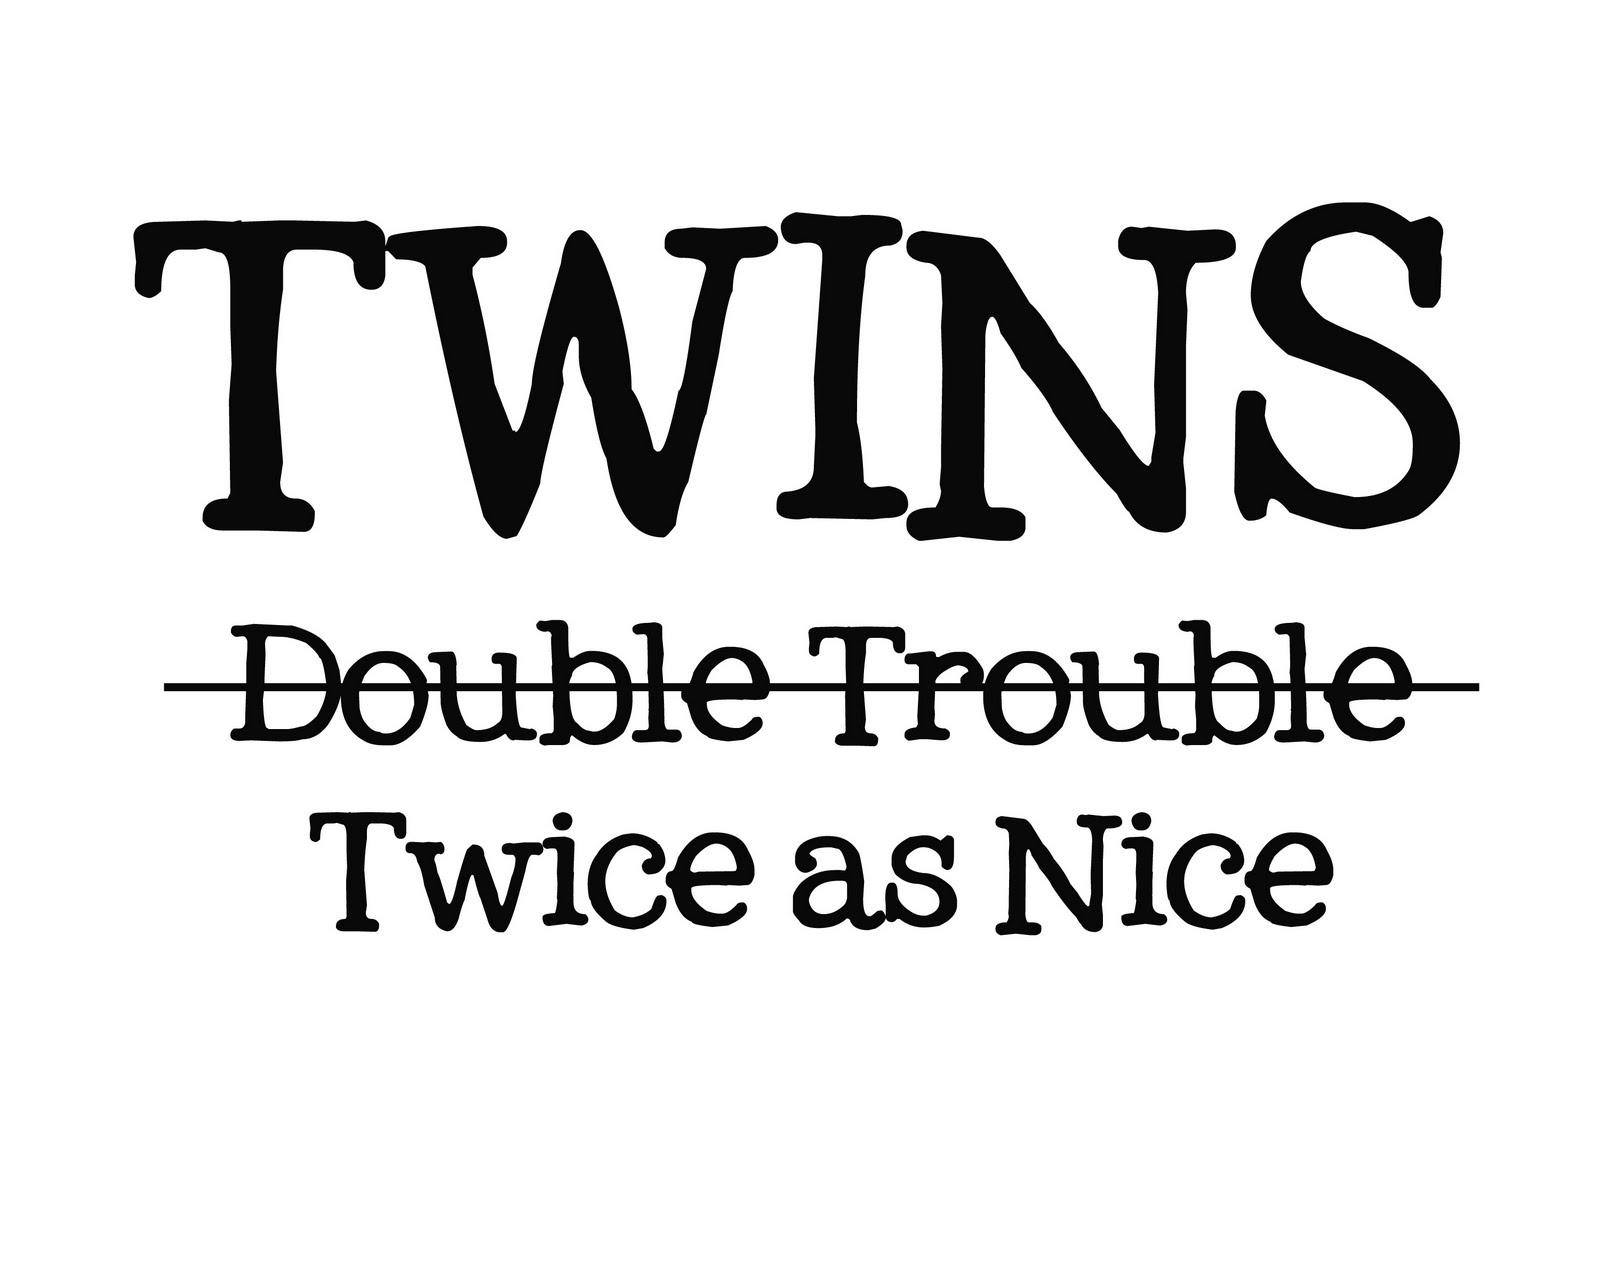 Double The Trouble Quotes: Digi-design: New T-shirt Designs